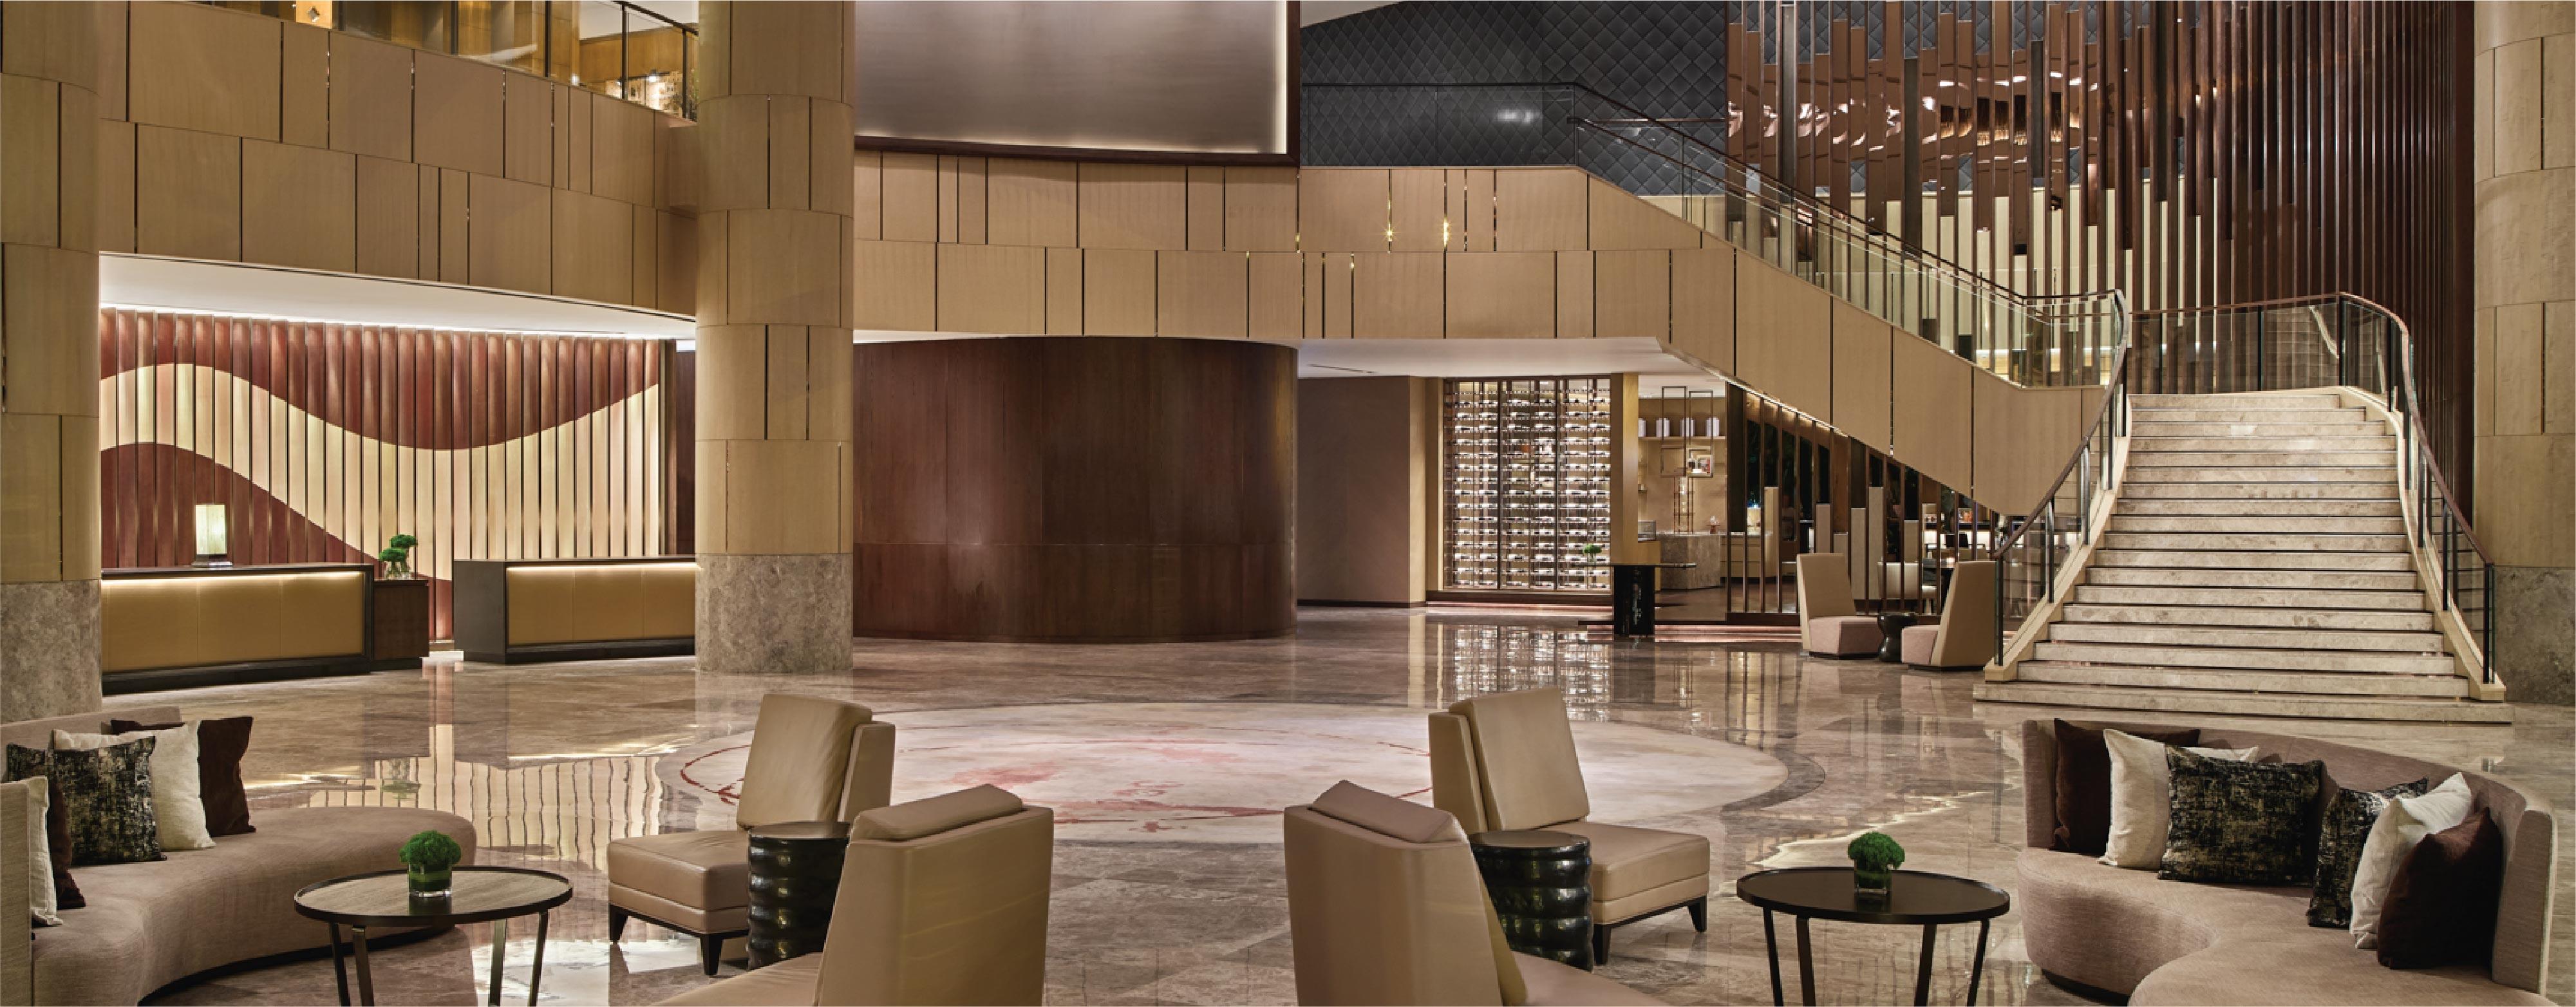 Luxury 5-star Hotel in Ho Chi Minh City | New World Saigon Hotel